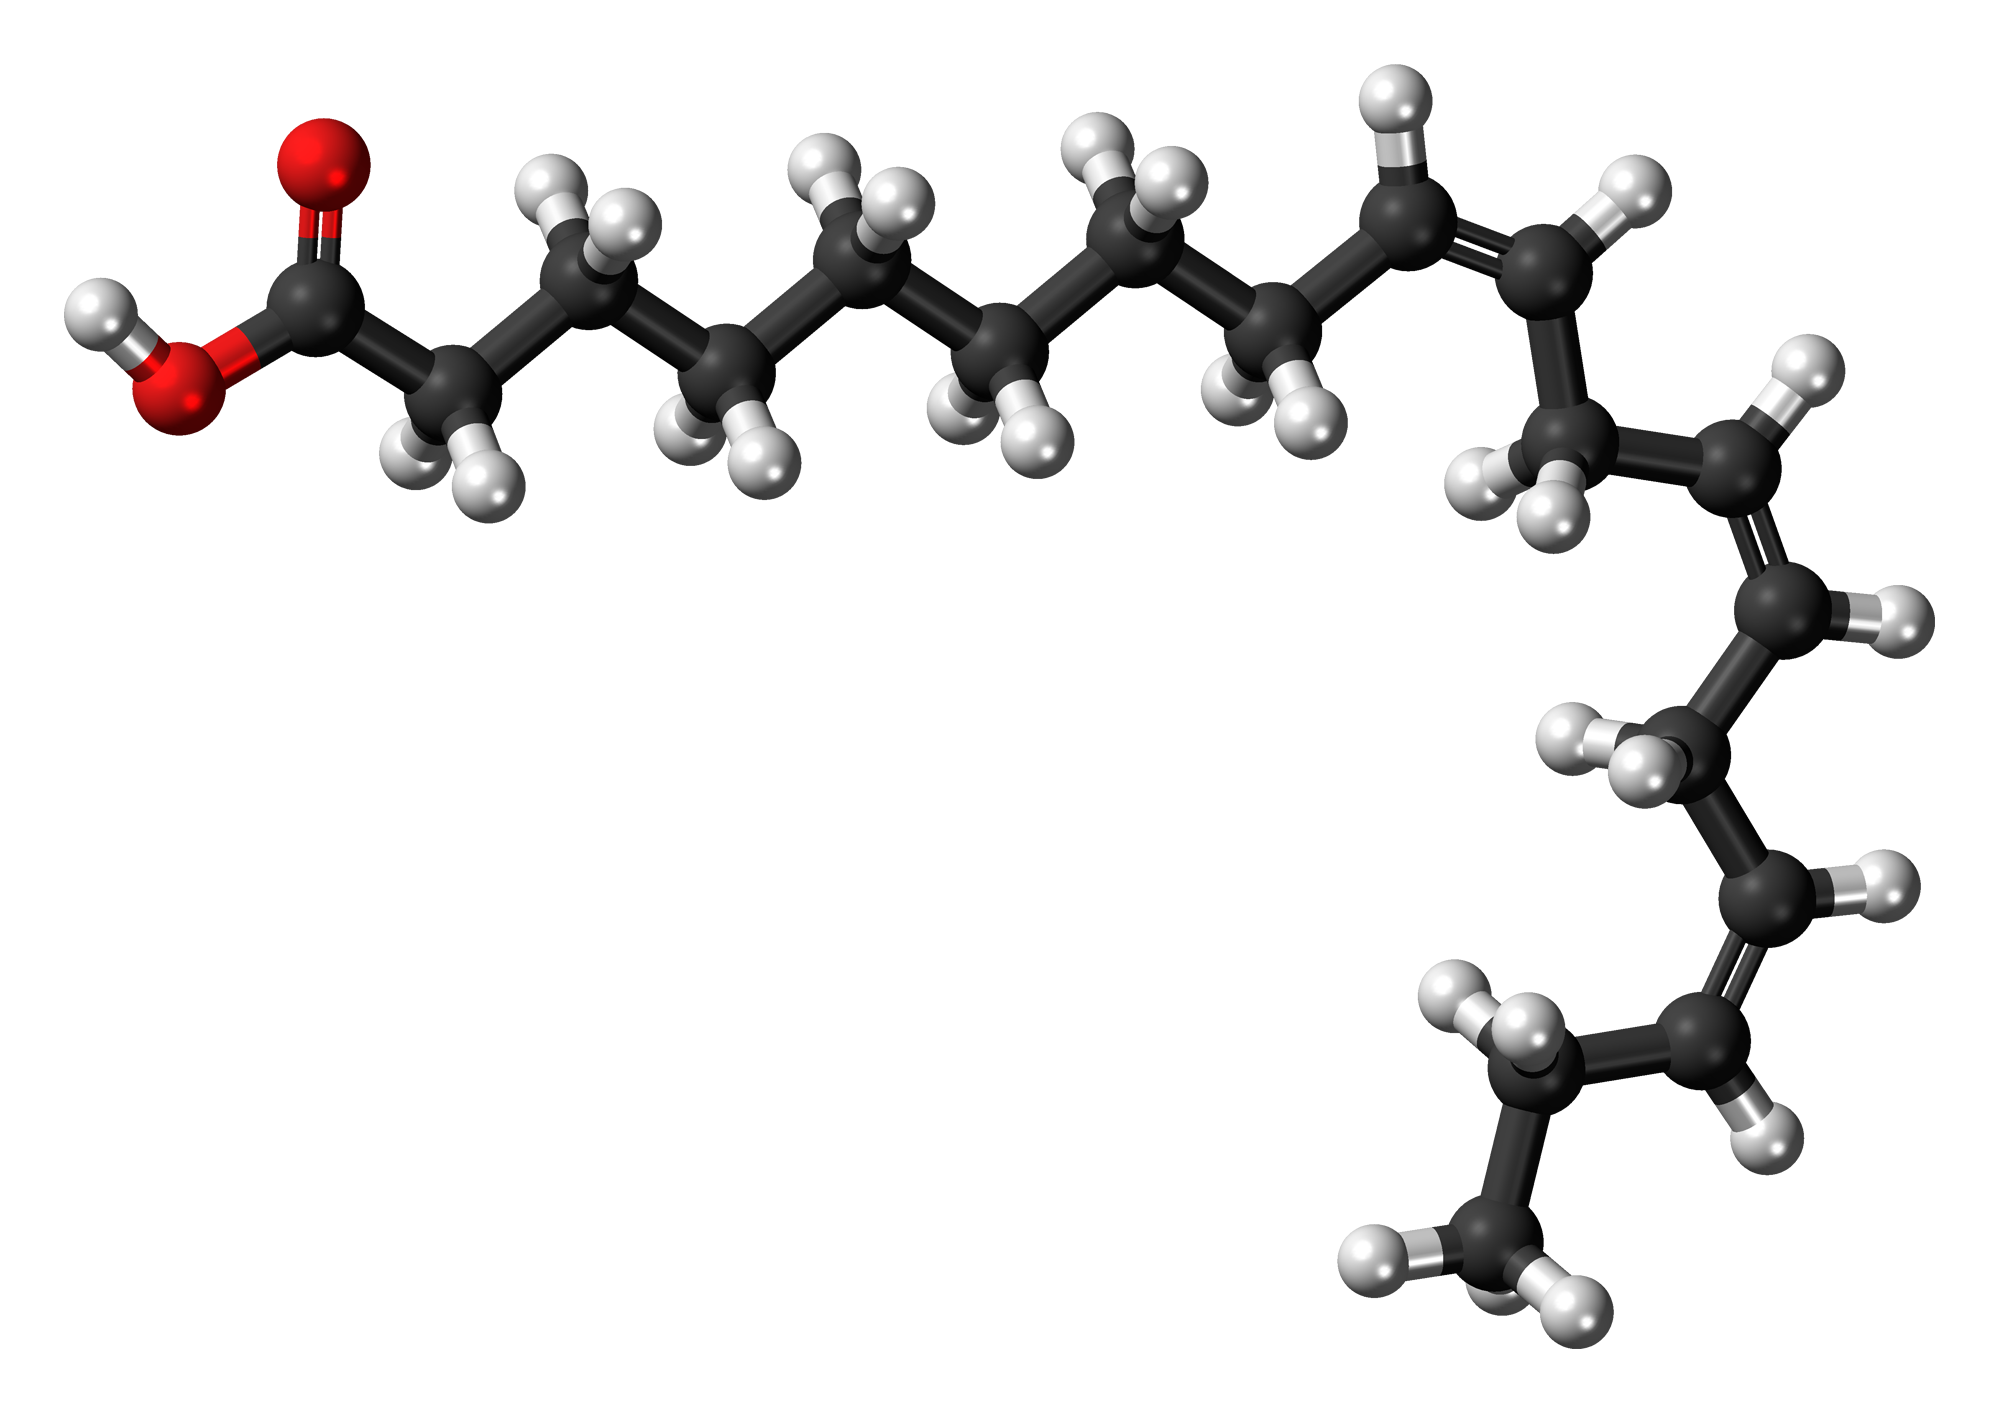 File:Alpha-Linolenic-acid-3D-balls.png - Wikimedia Commons